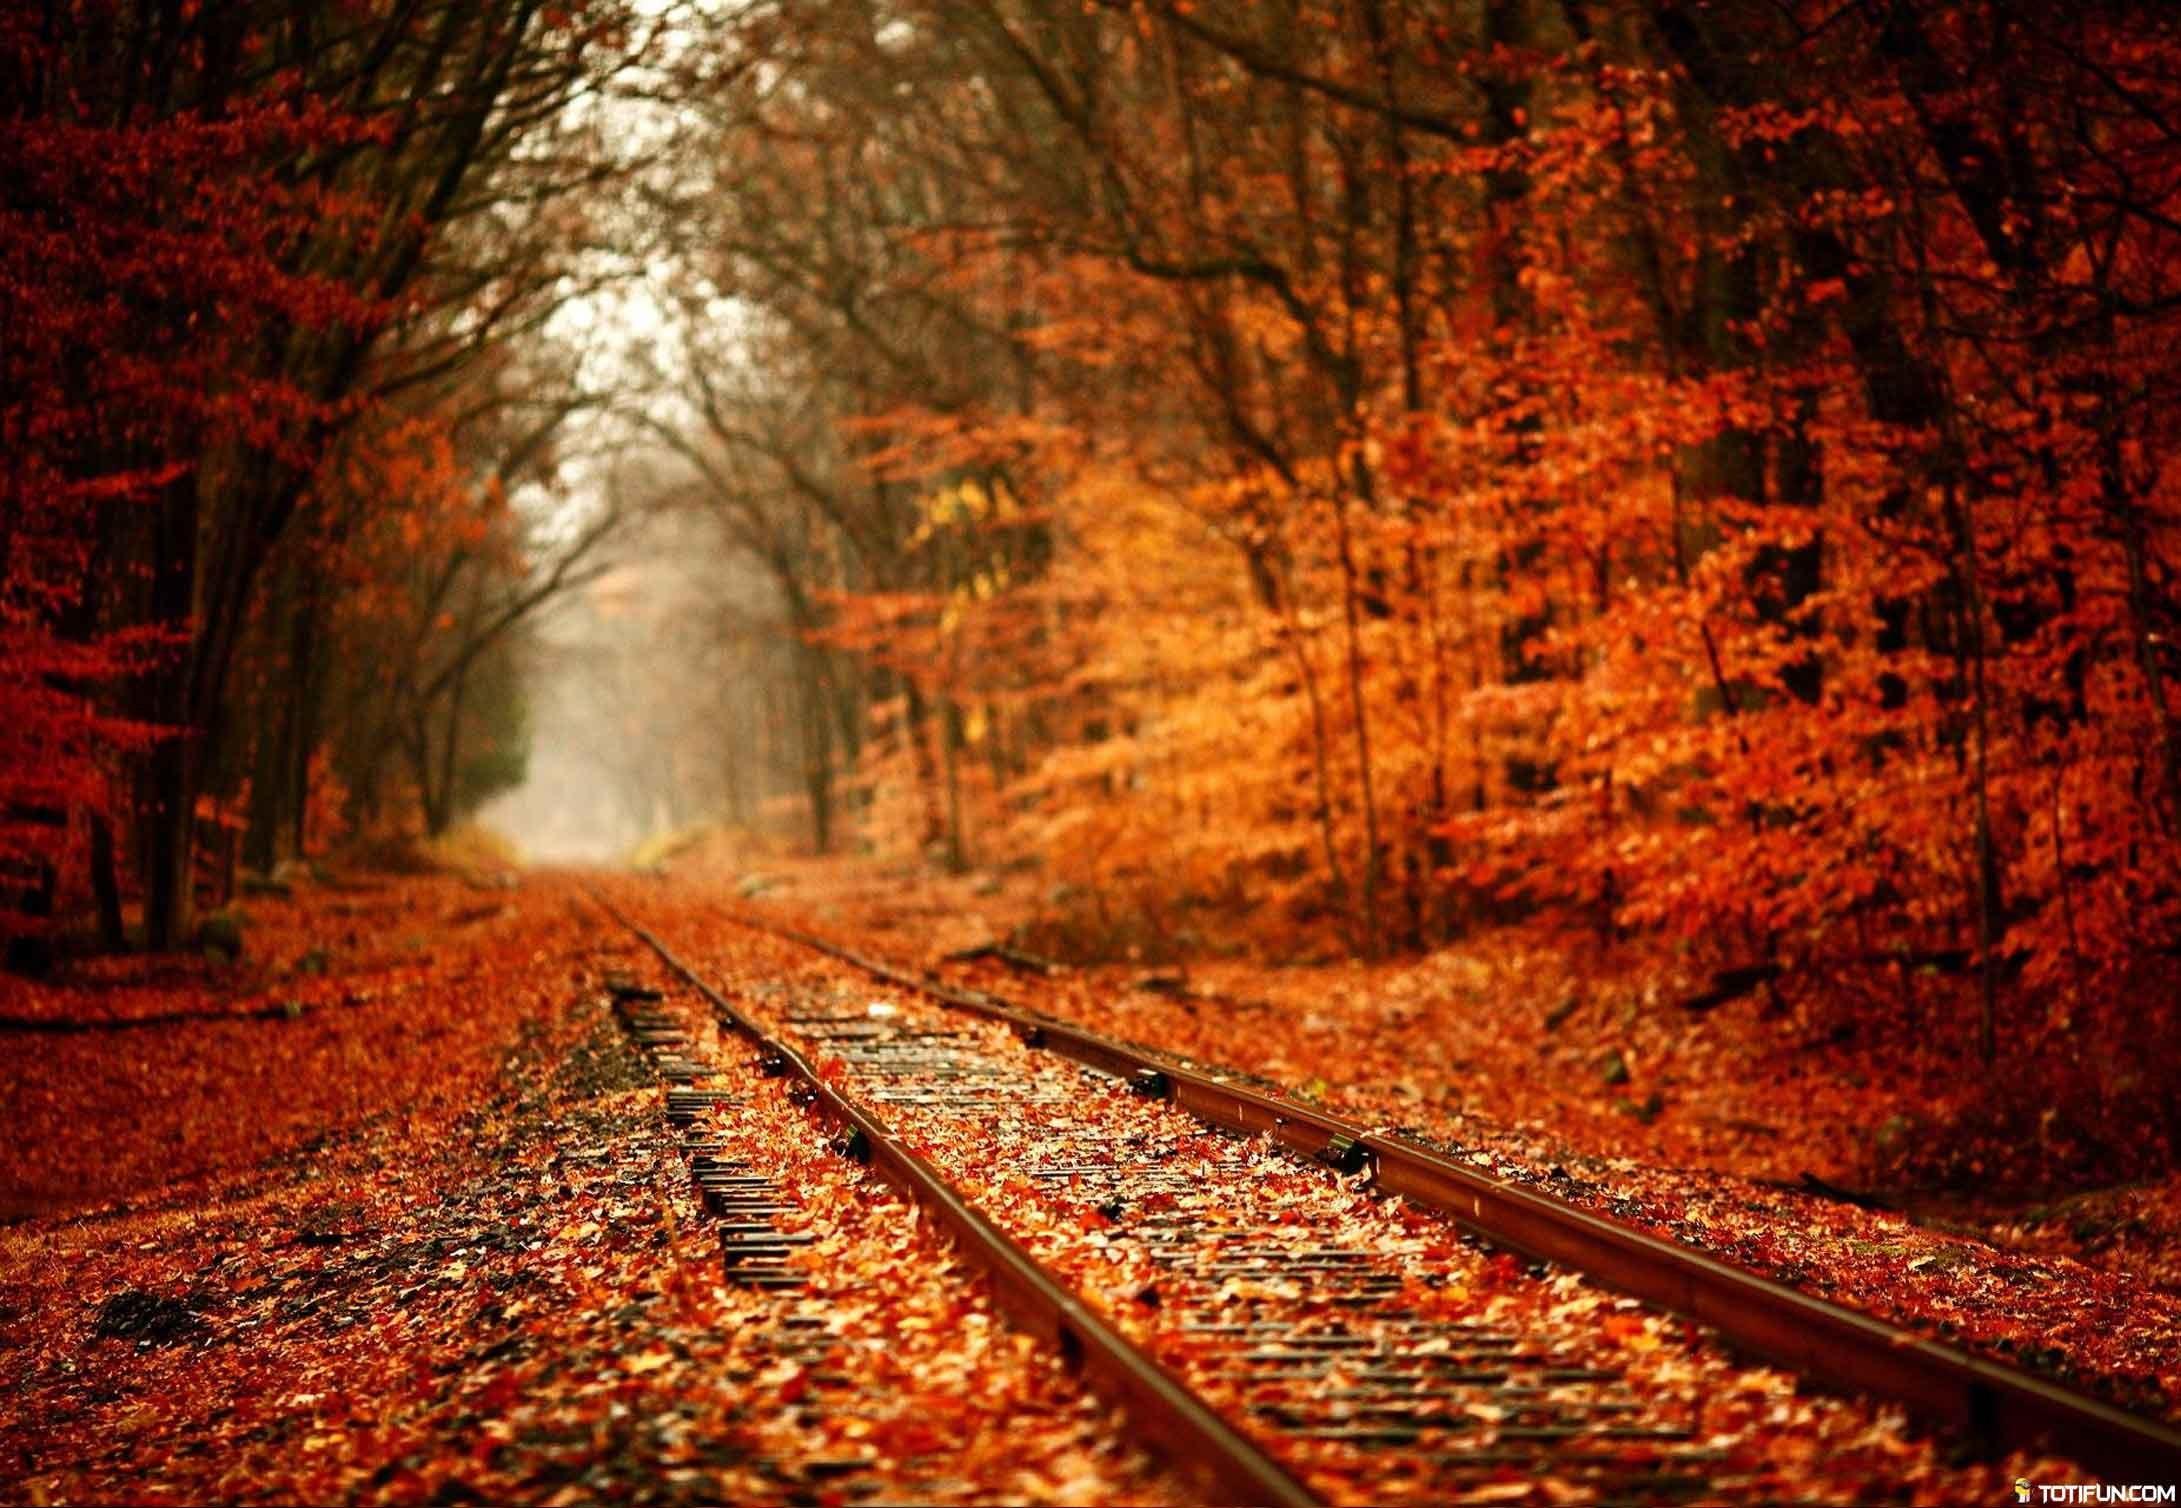 Autumn HD Wallpapers #TotiFun #Wallpapers #HDWallpapers #Autumn